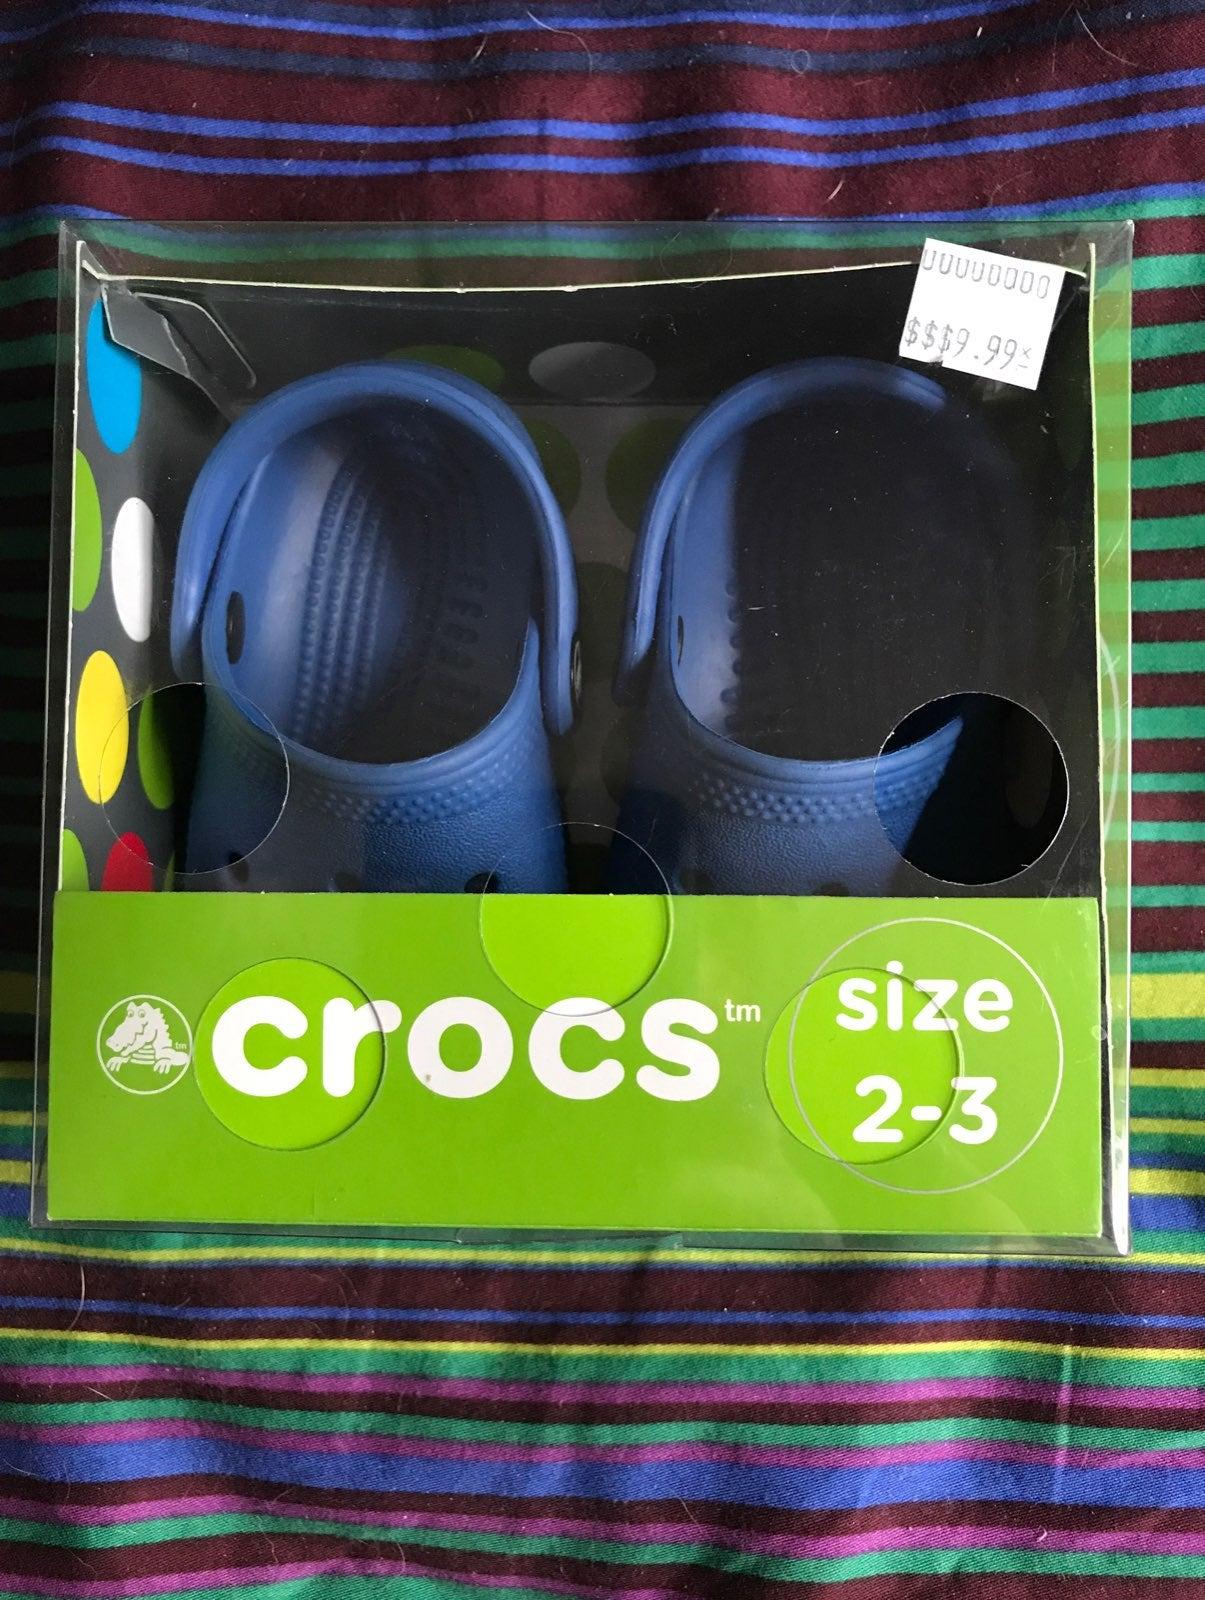 Crocs 2-3